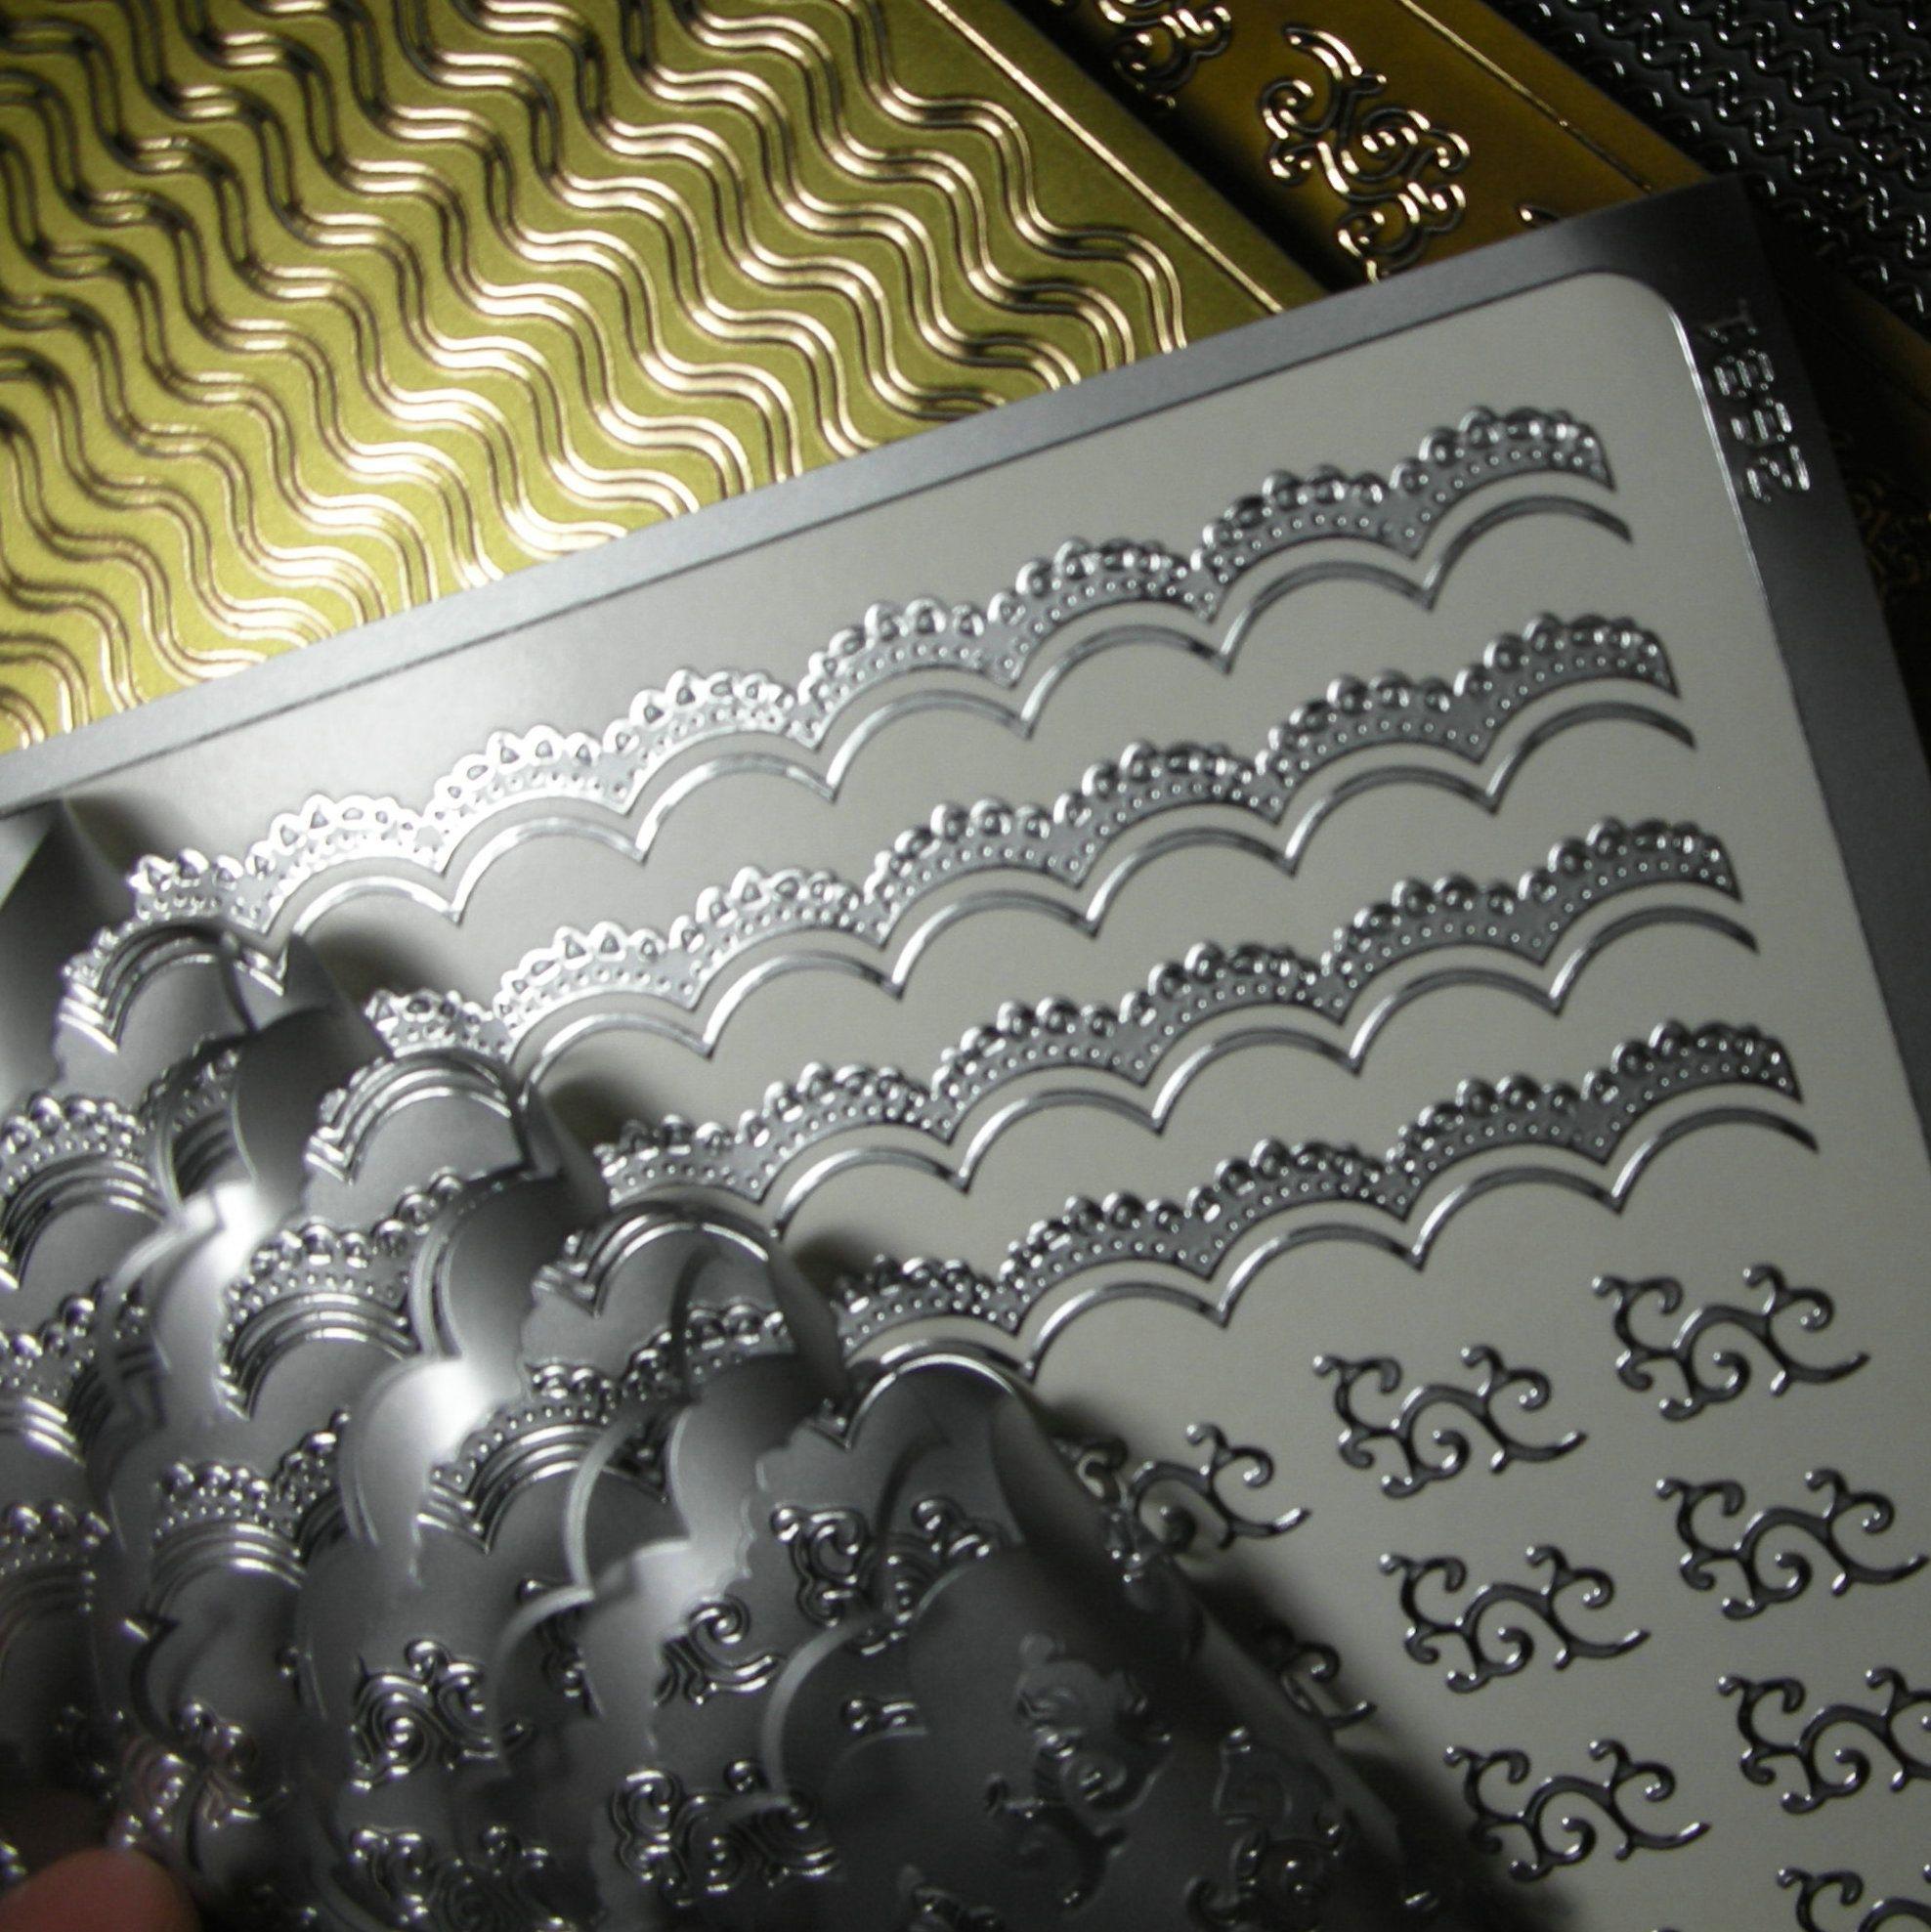 Nail Tattoo 18 Gold + 7 Silver + ed Metal Nail Decal Decals Metallic ...